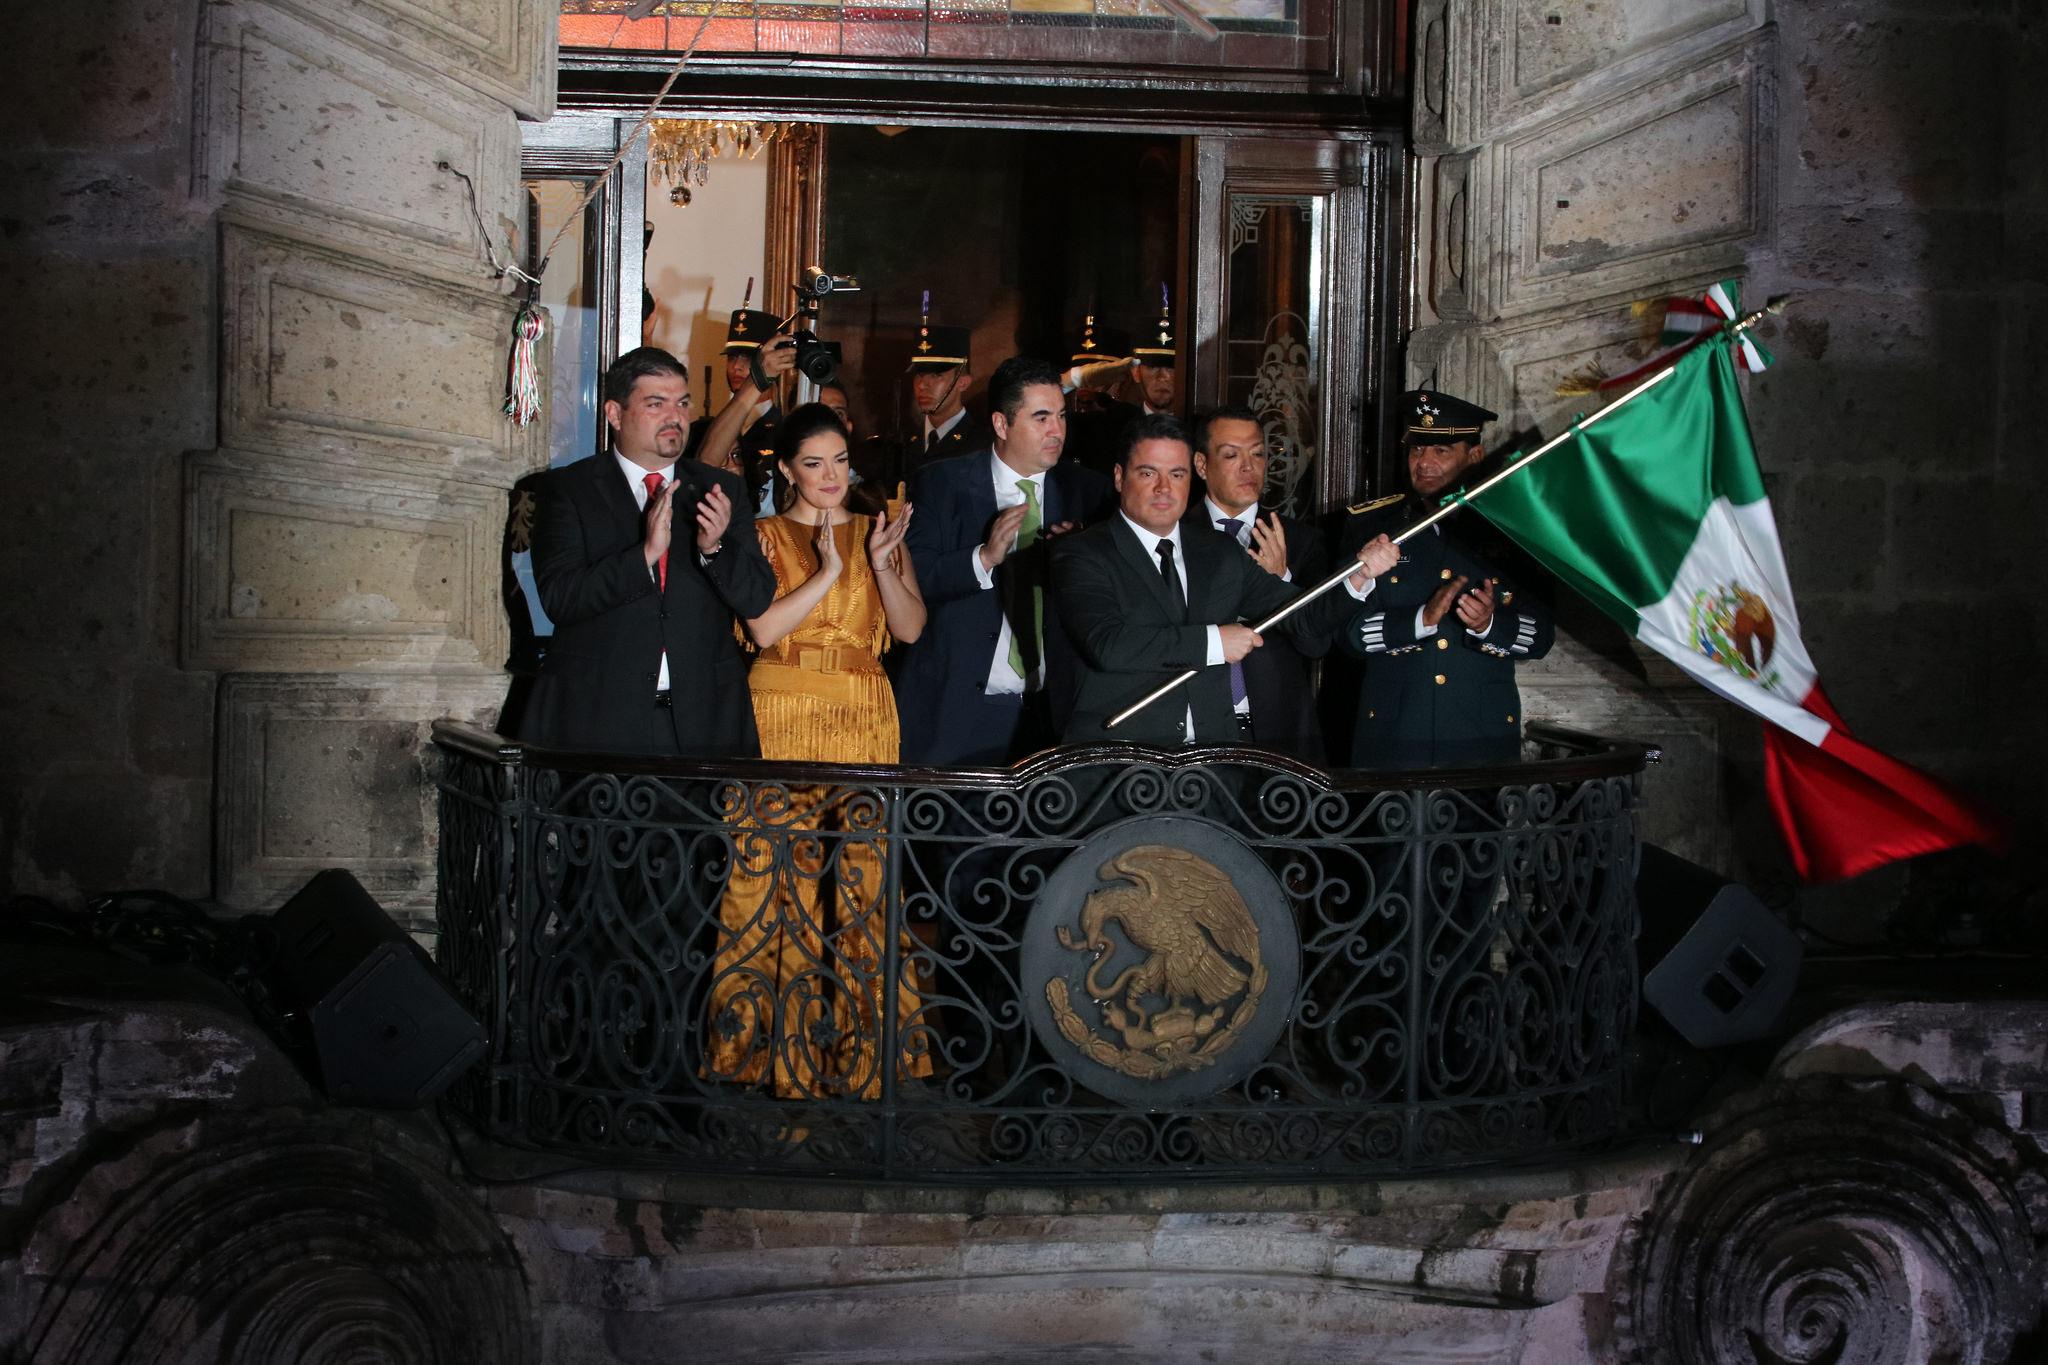 Photo of Encabeza Gobernador ceremonia del Grito de Independencia en Jalisco